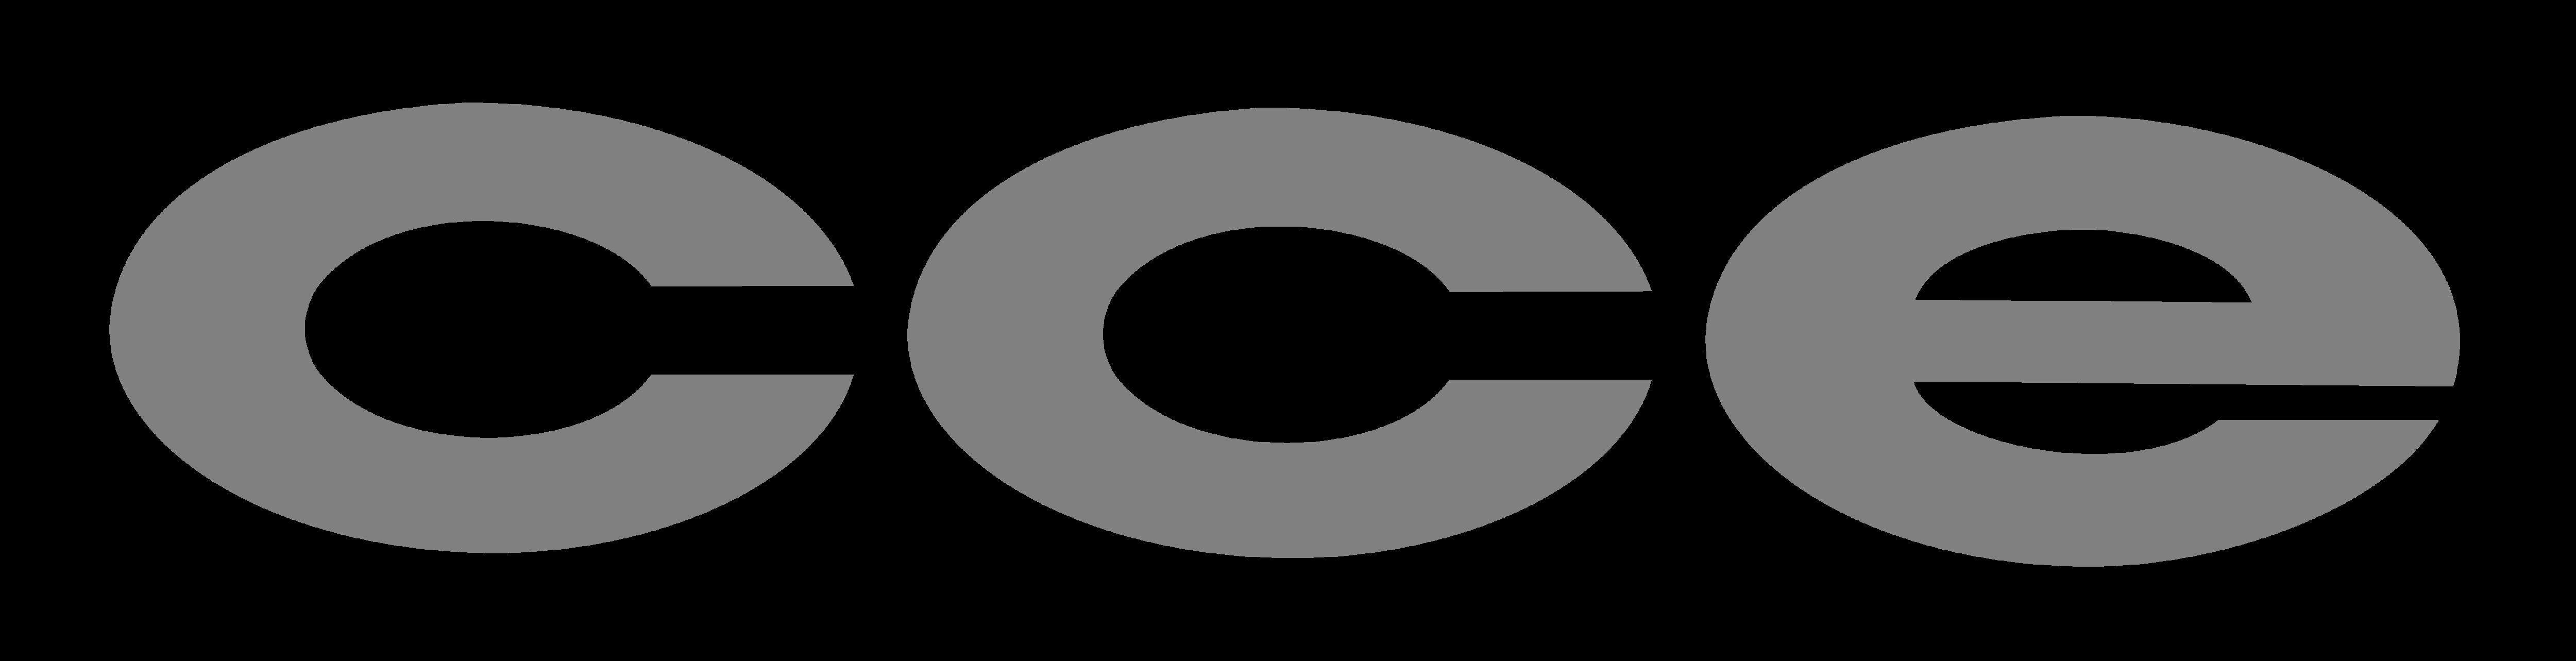 cce-logo-2